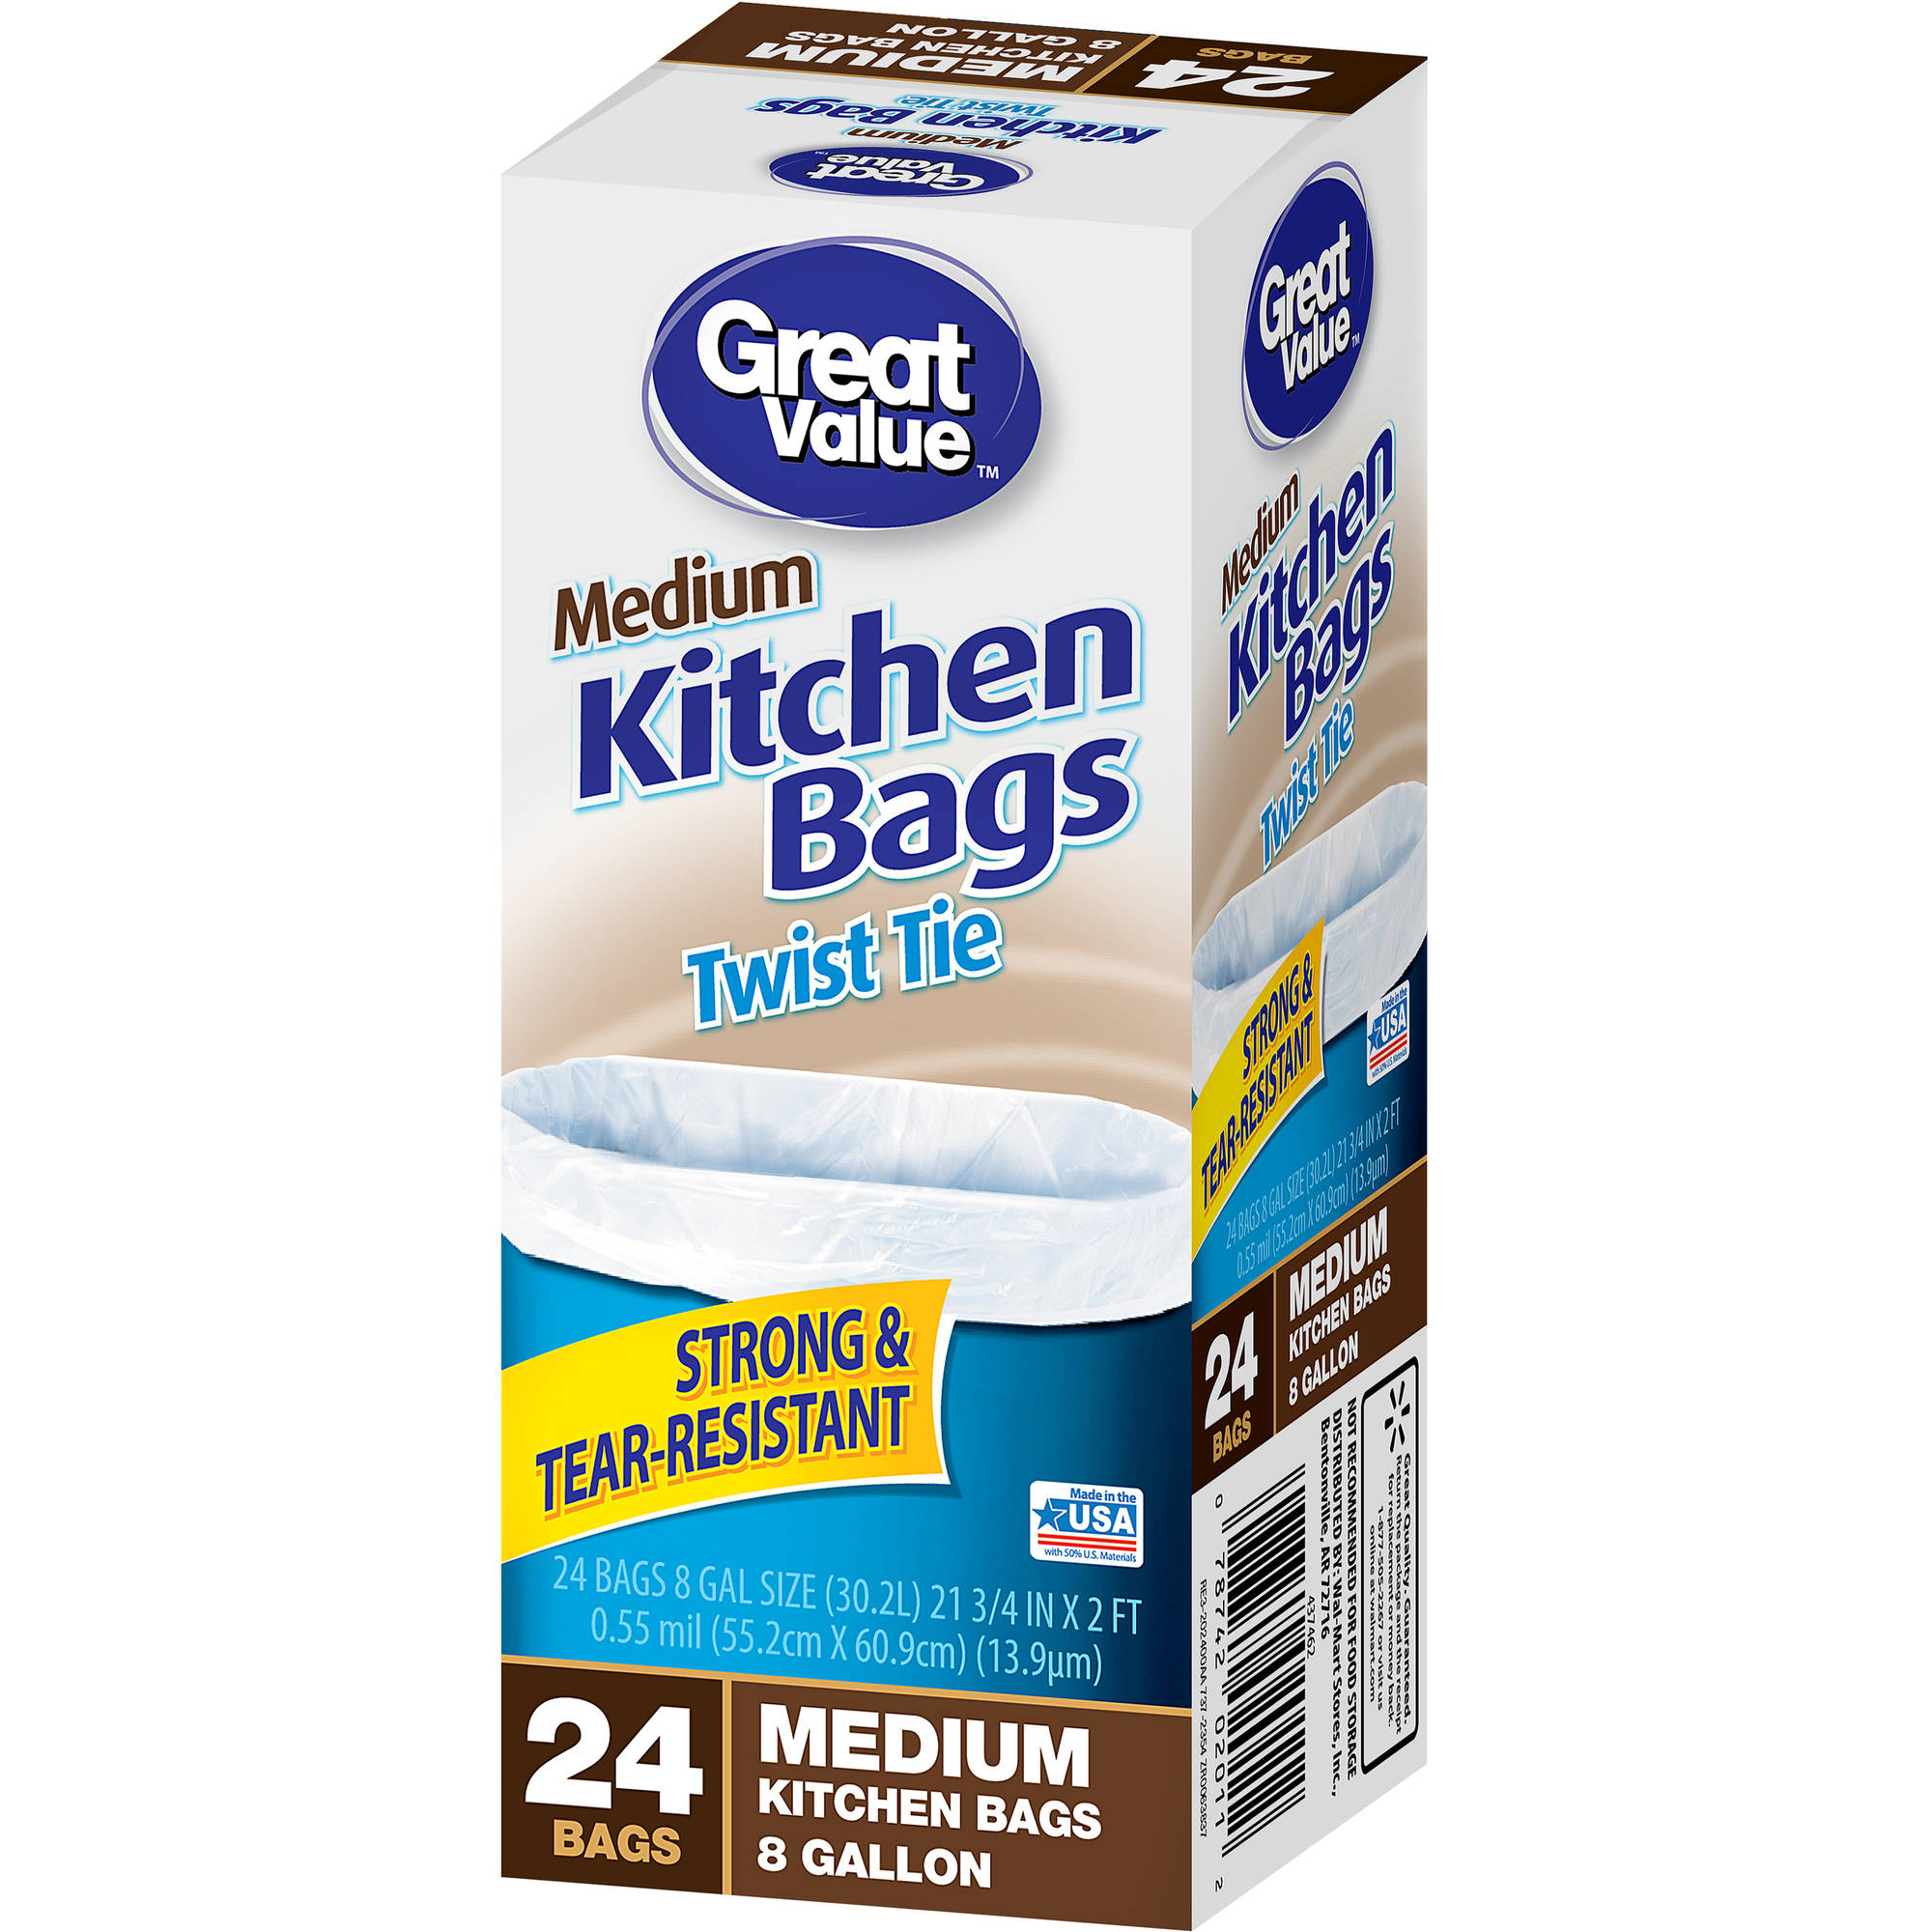 Great Value Twist Tie Medium Kitchen Bags, 8 Gallon, 24 Ct   Walmart.com